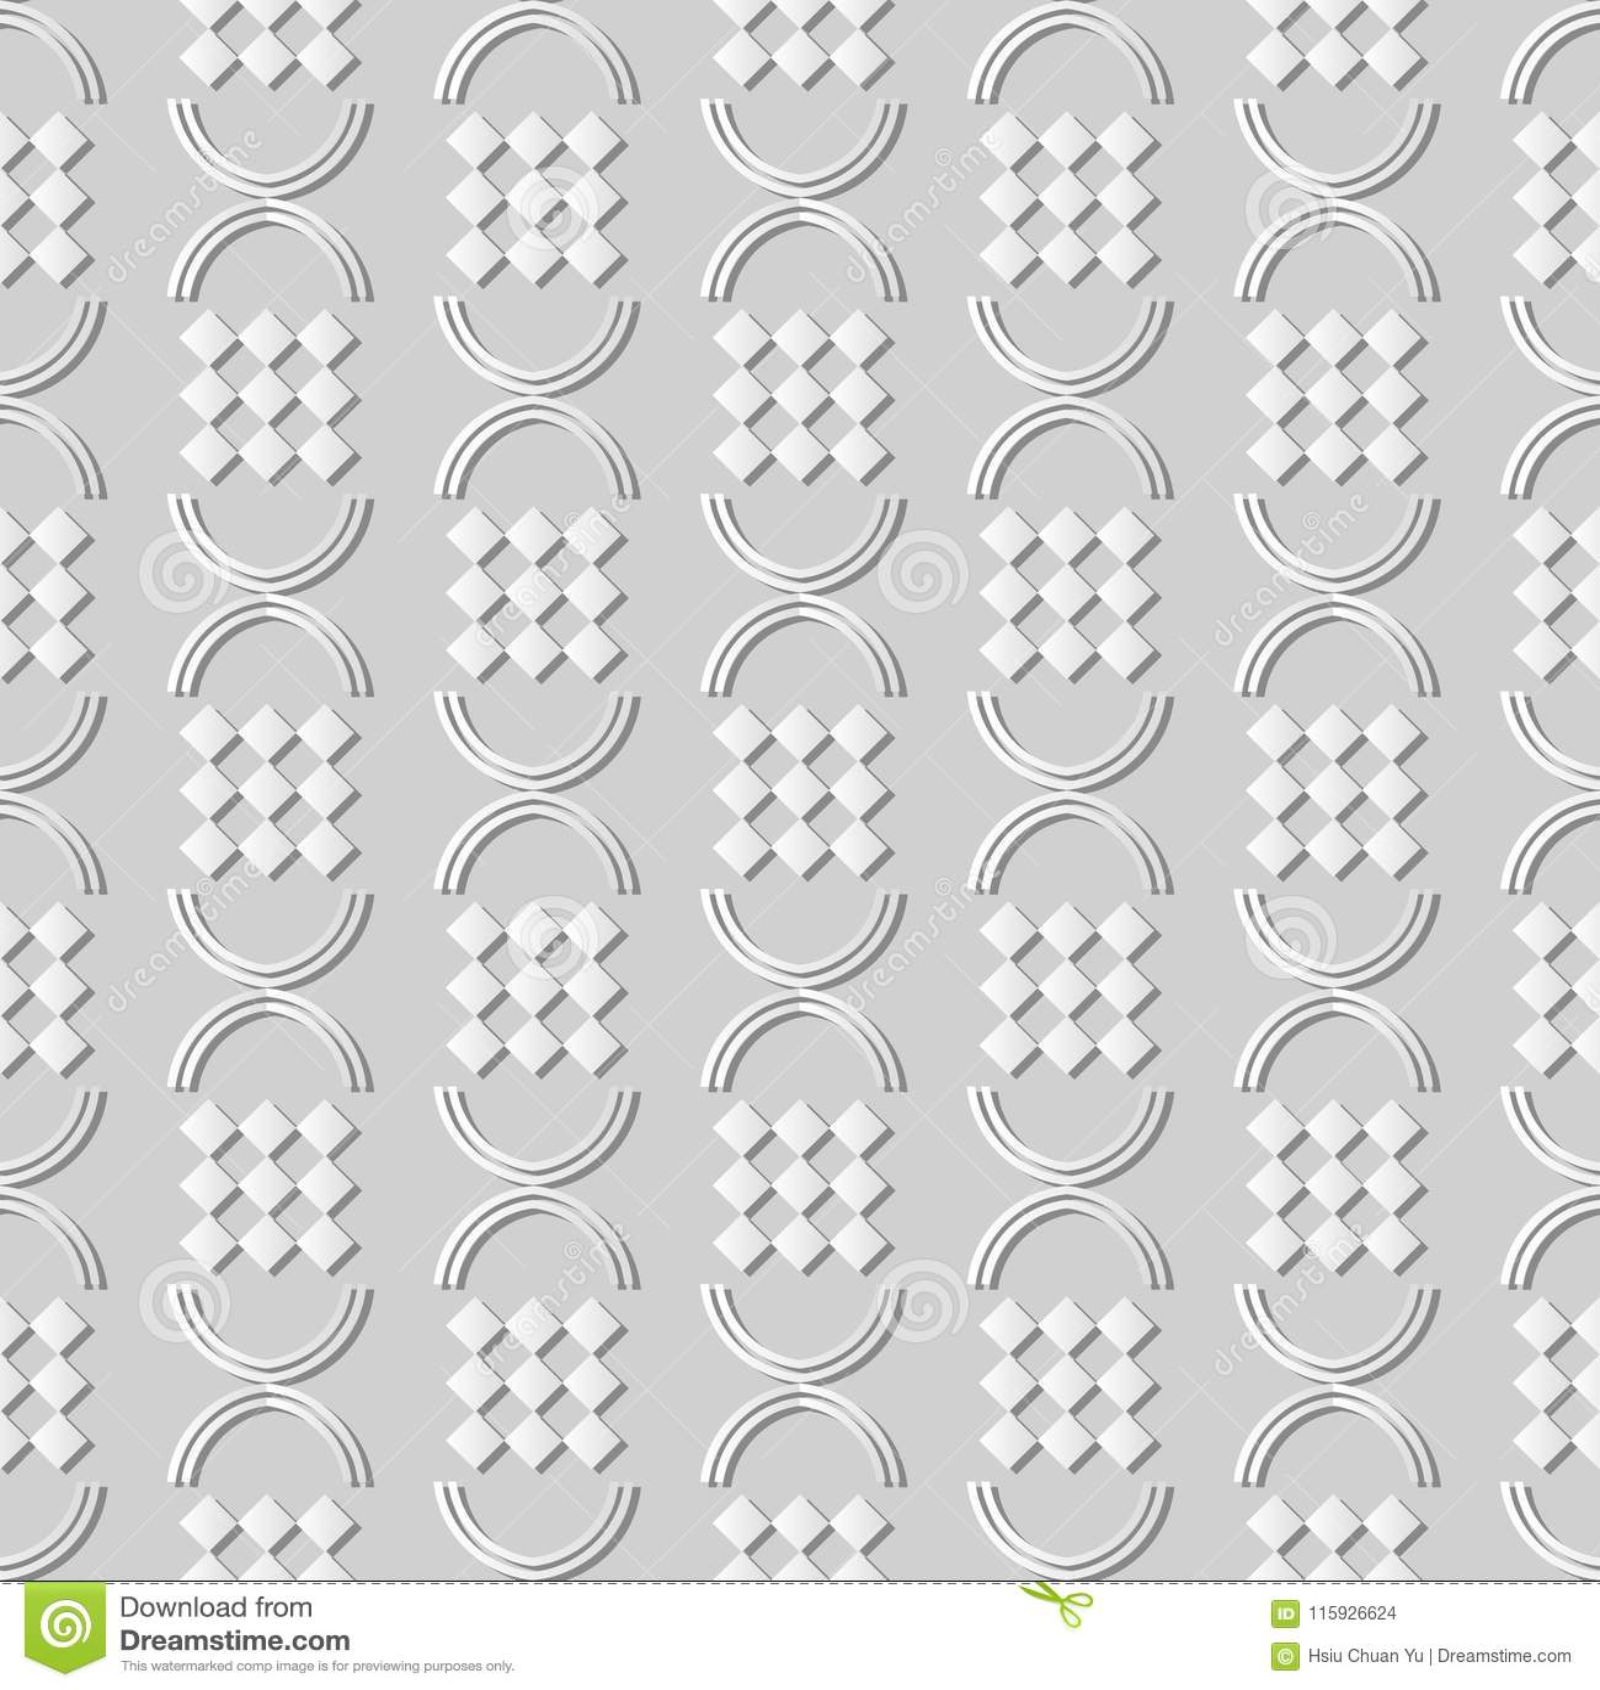 3d White Paper Art Curve Semi Circle Round Check Geometry